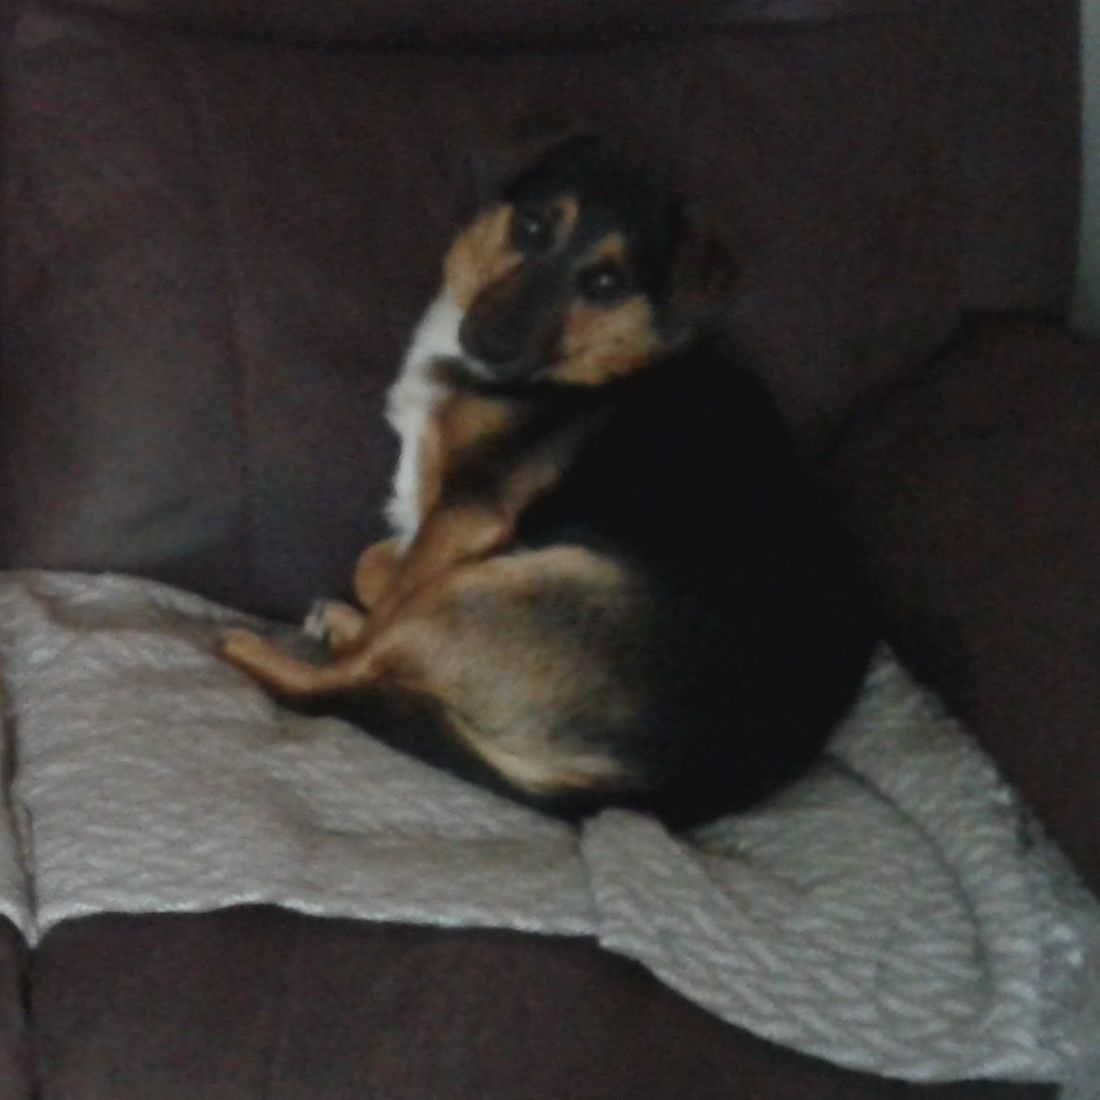 Cute Jack Russell on sofa